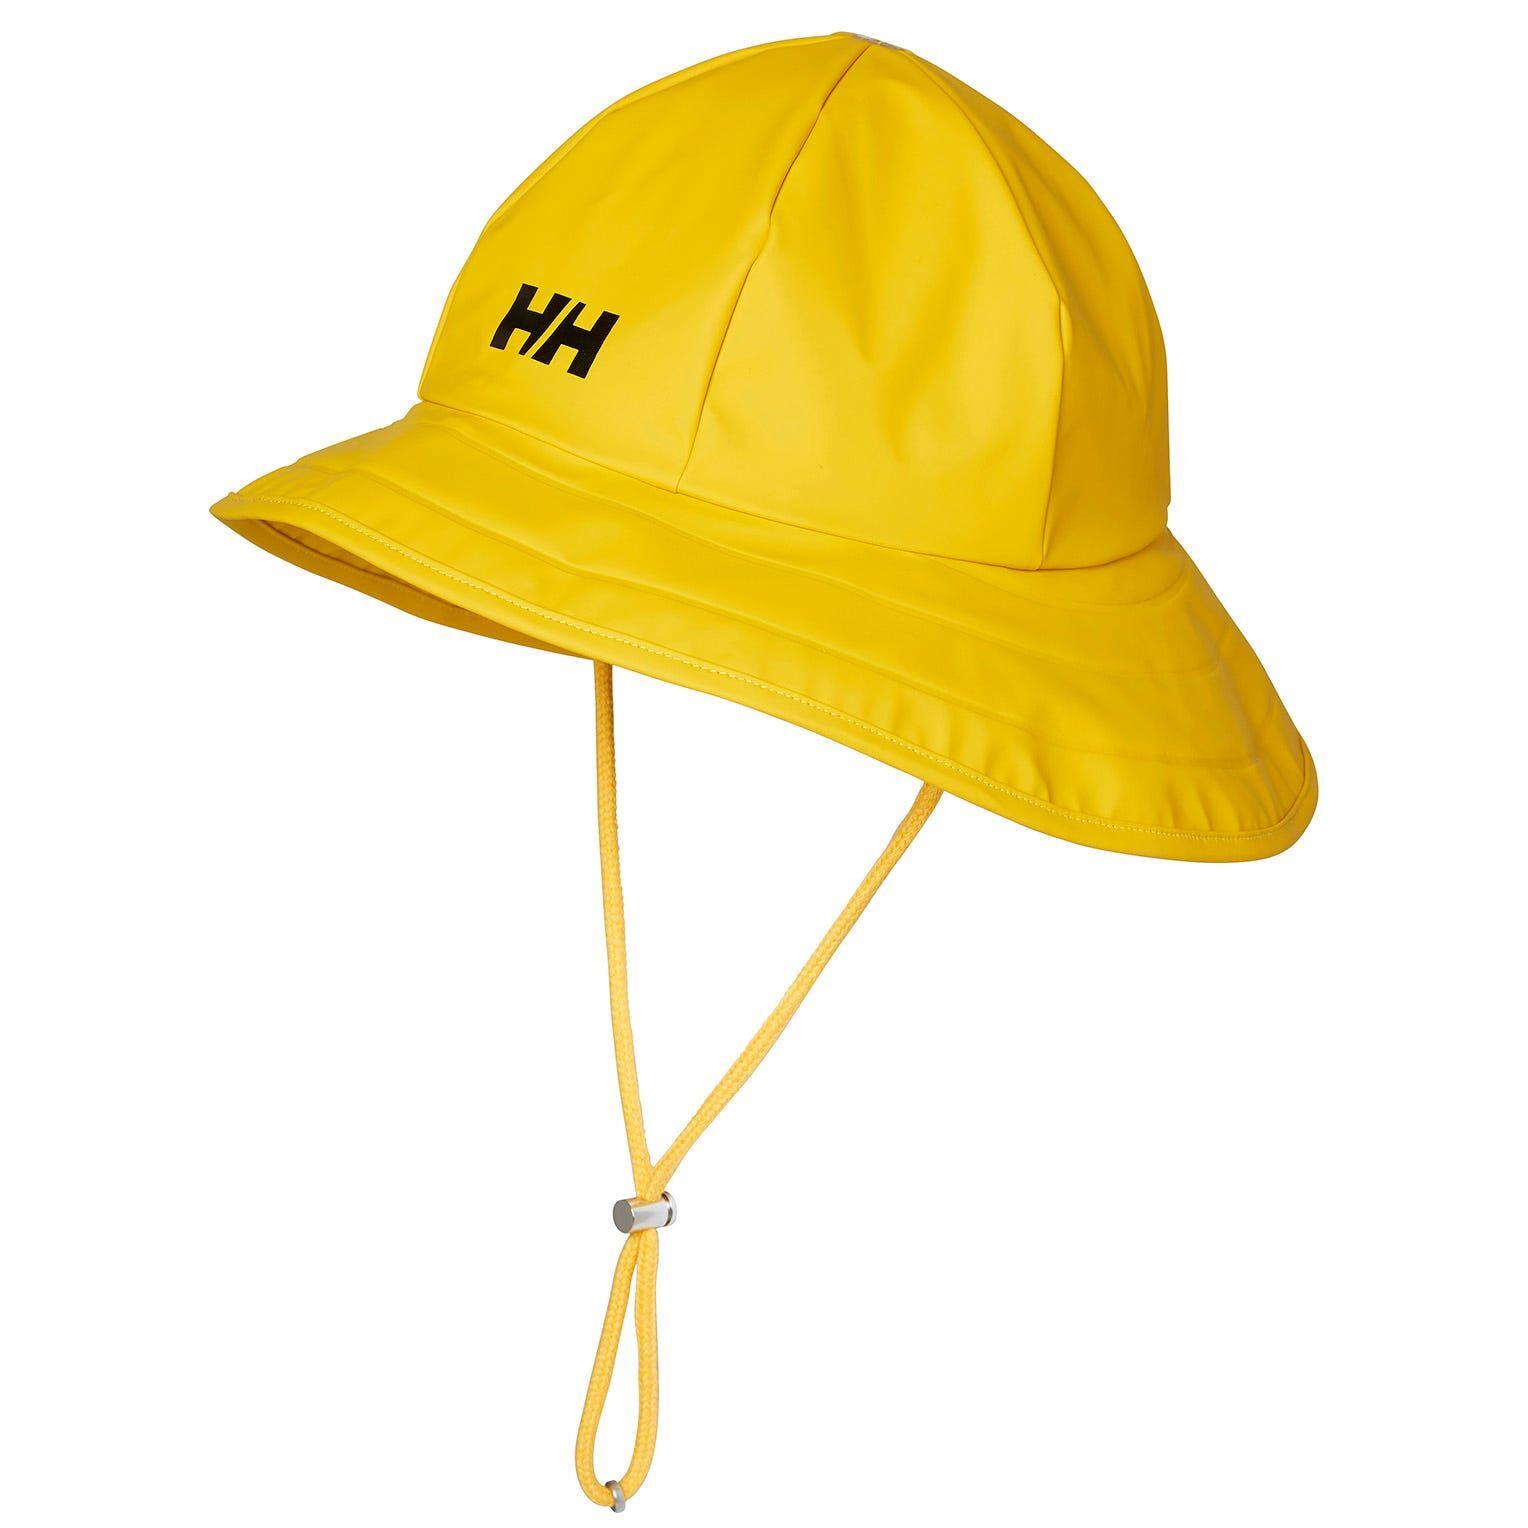 Helly Hansen Moss Souwester Rain Jacket Yellow STD